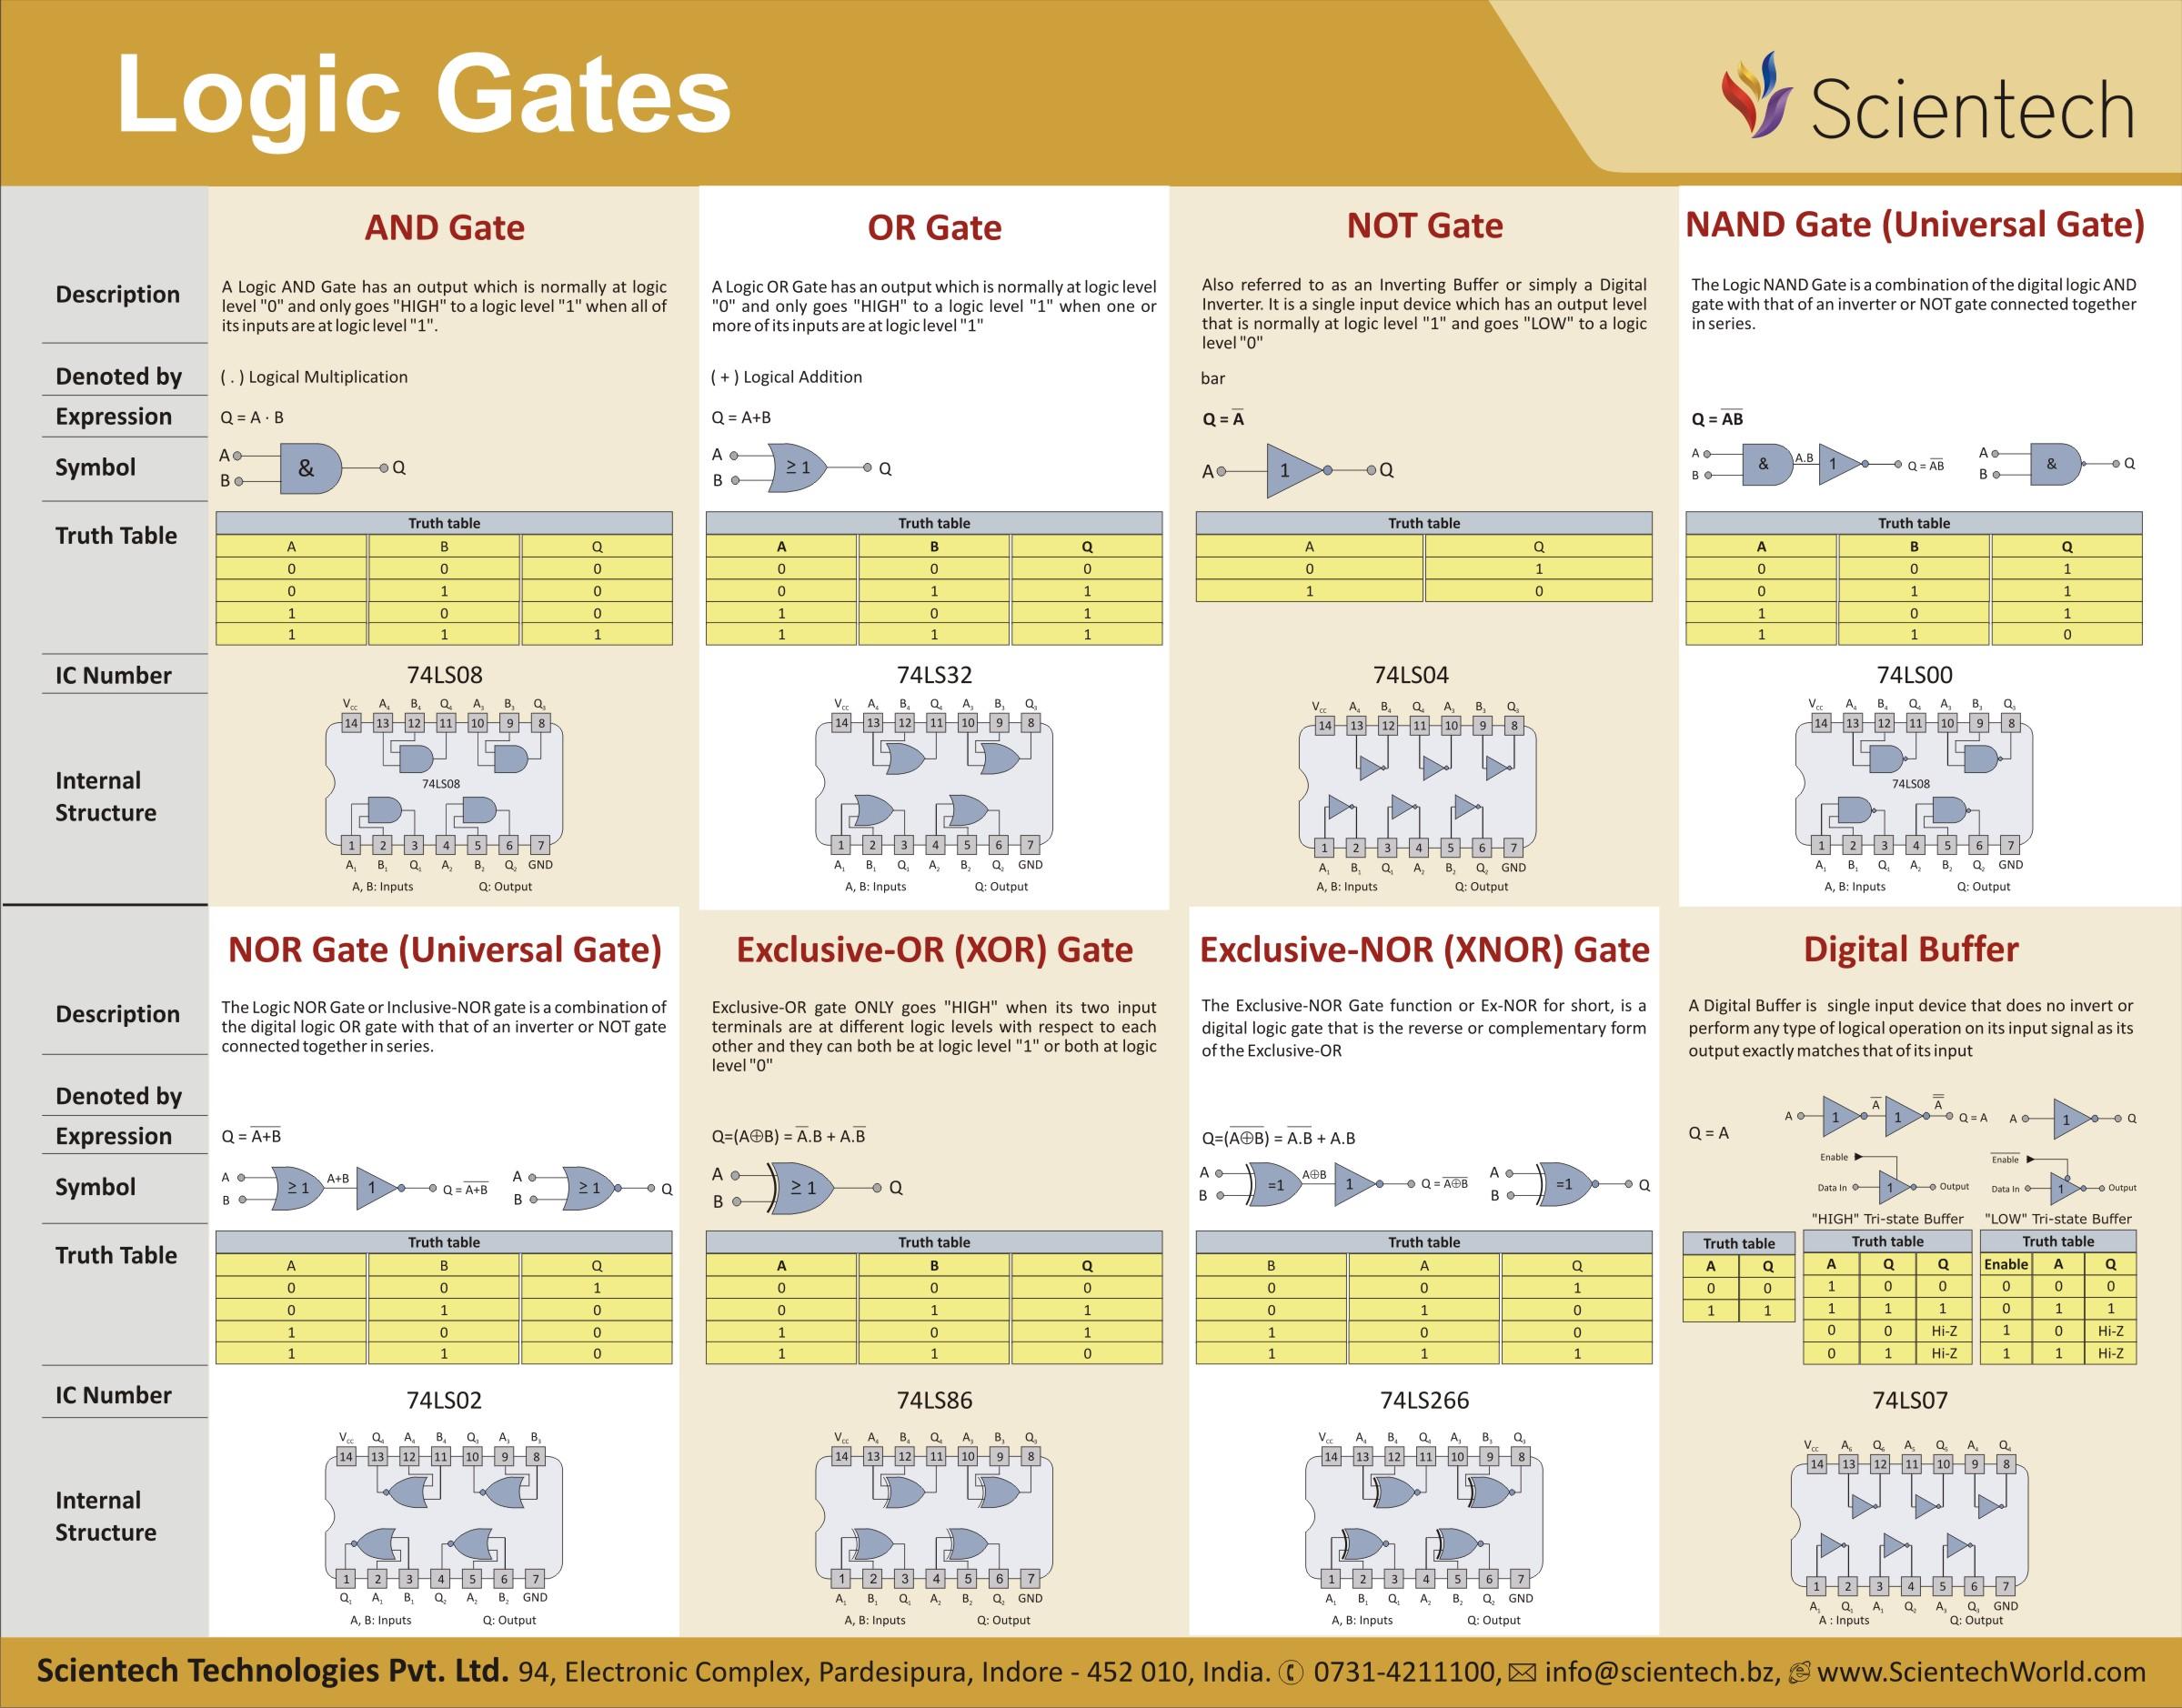 Download Calendar Download View Book Download Wallcharts